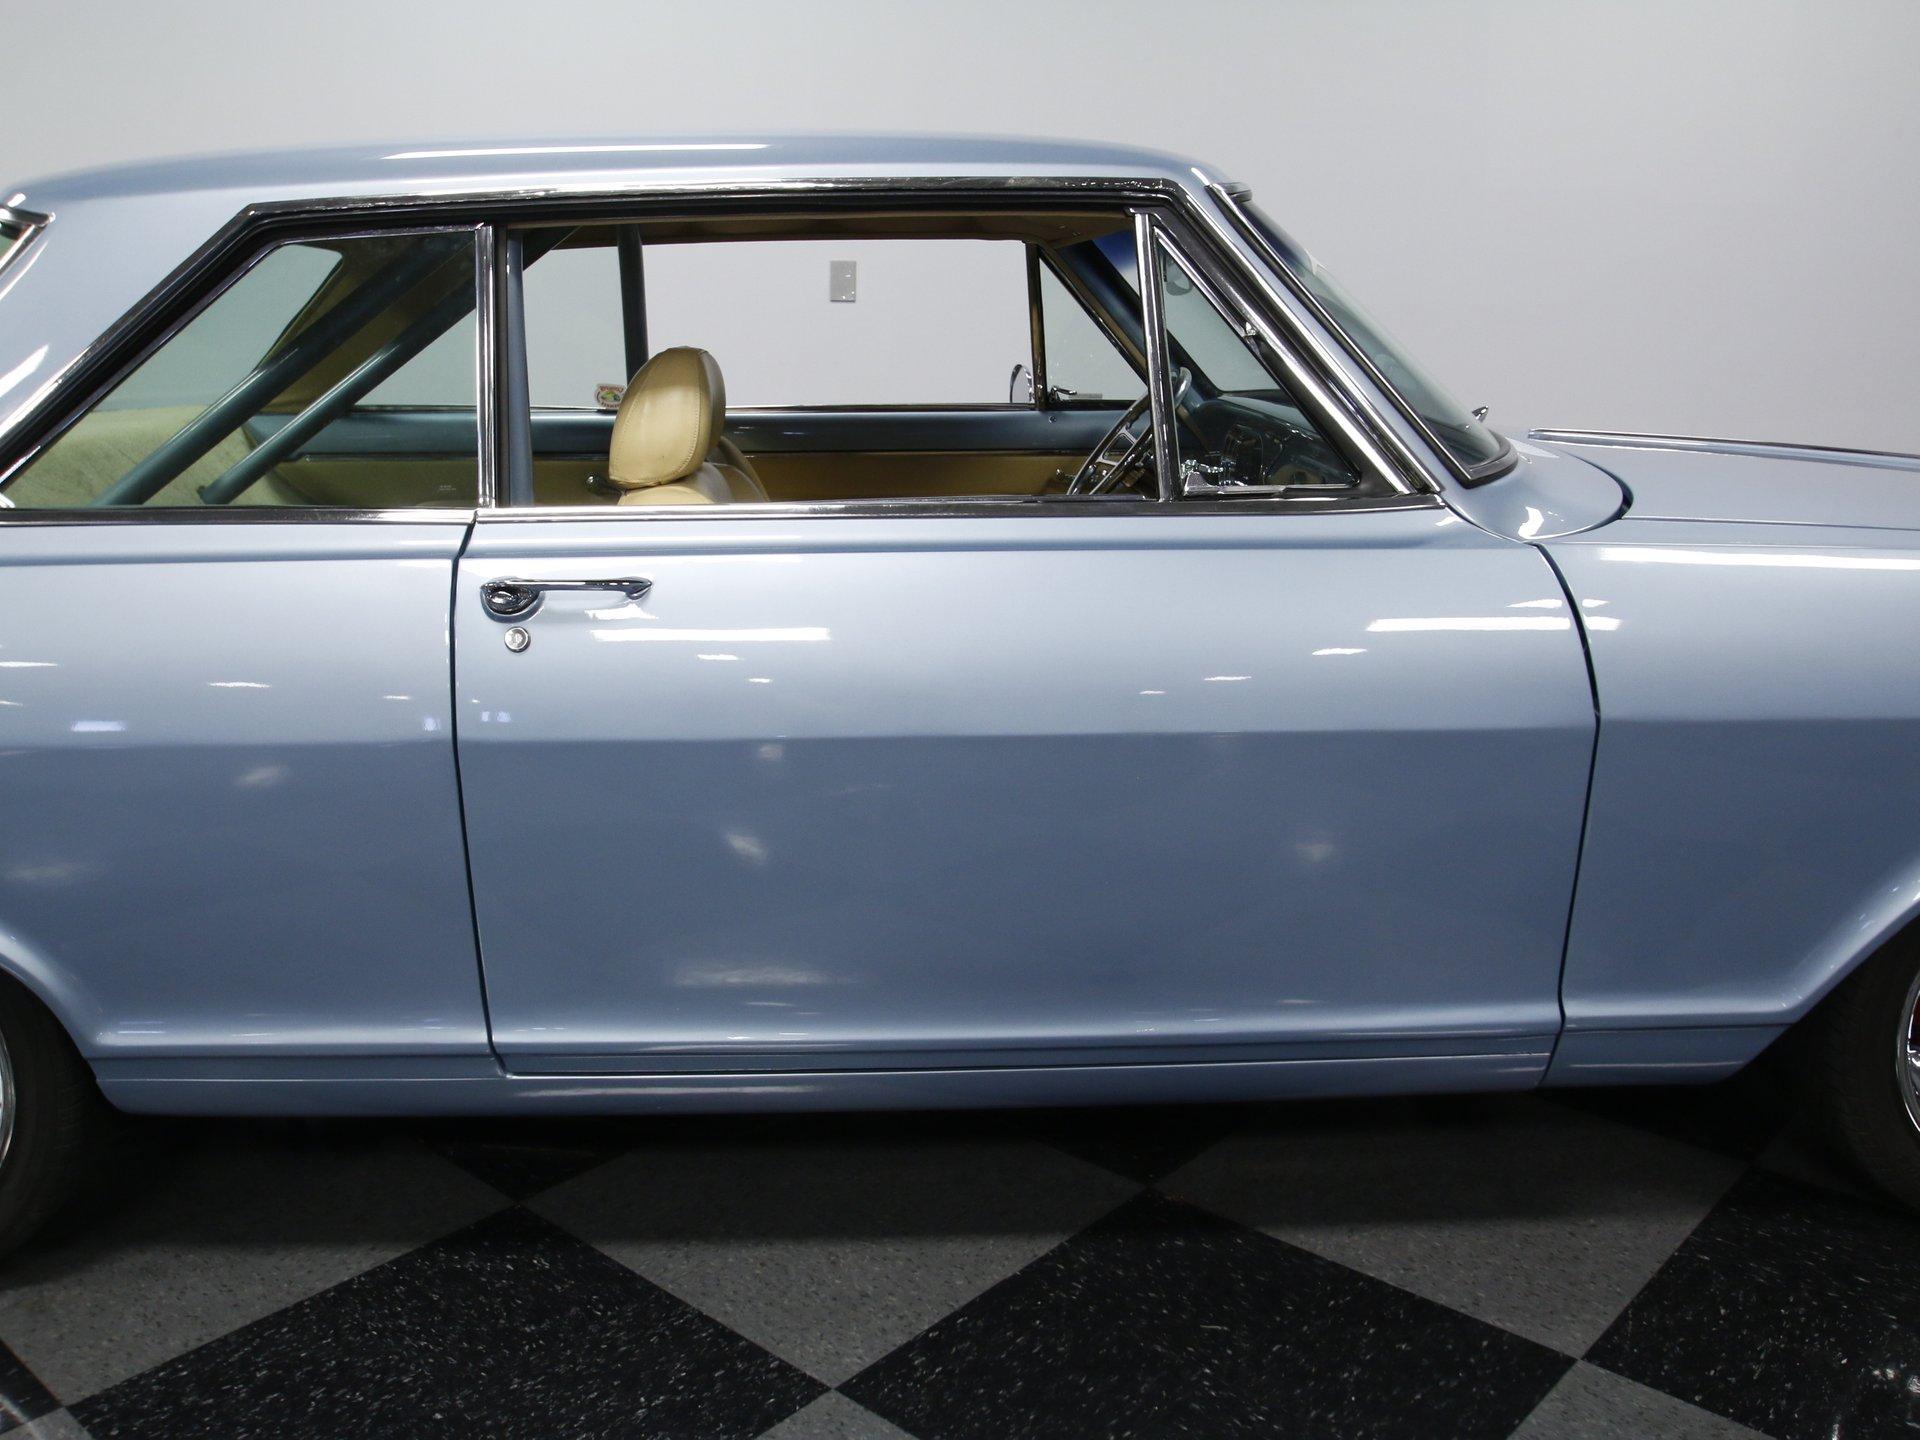 1962 Chevrolet Nova Chevy II Pro Touring for sale #64321 | MCG